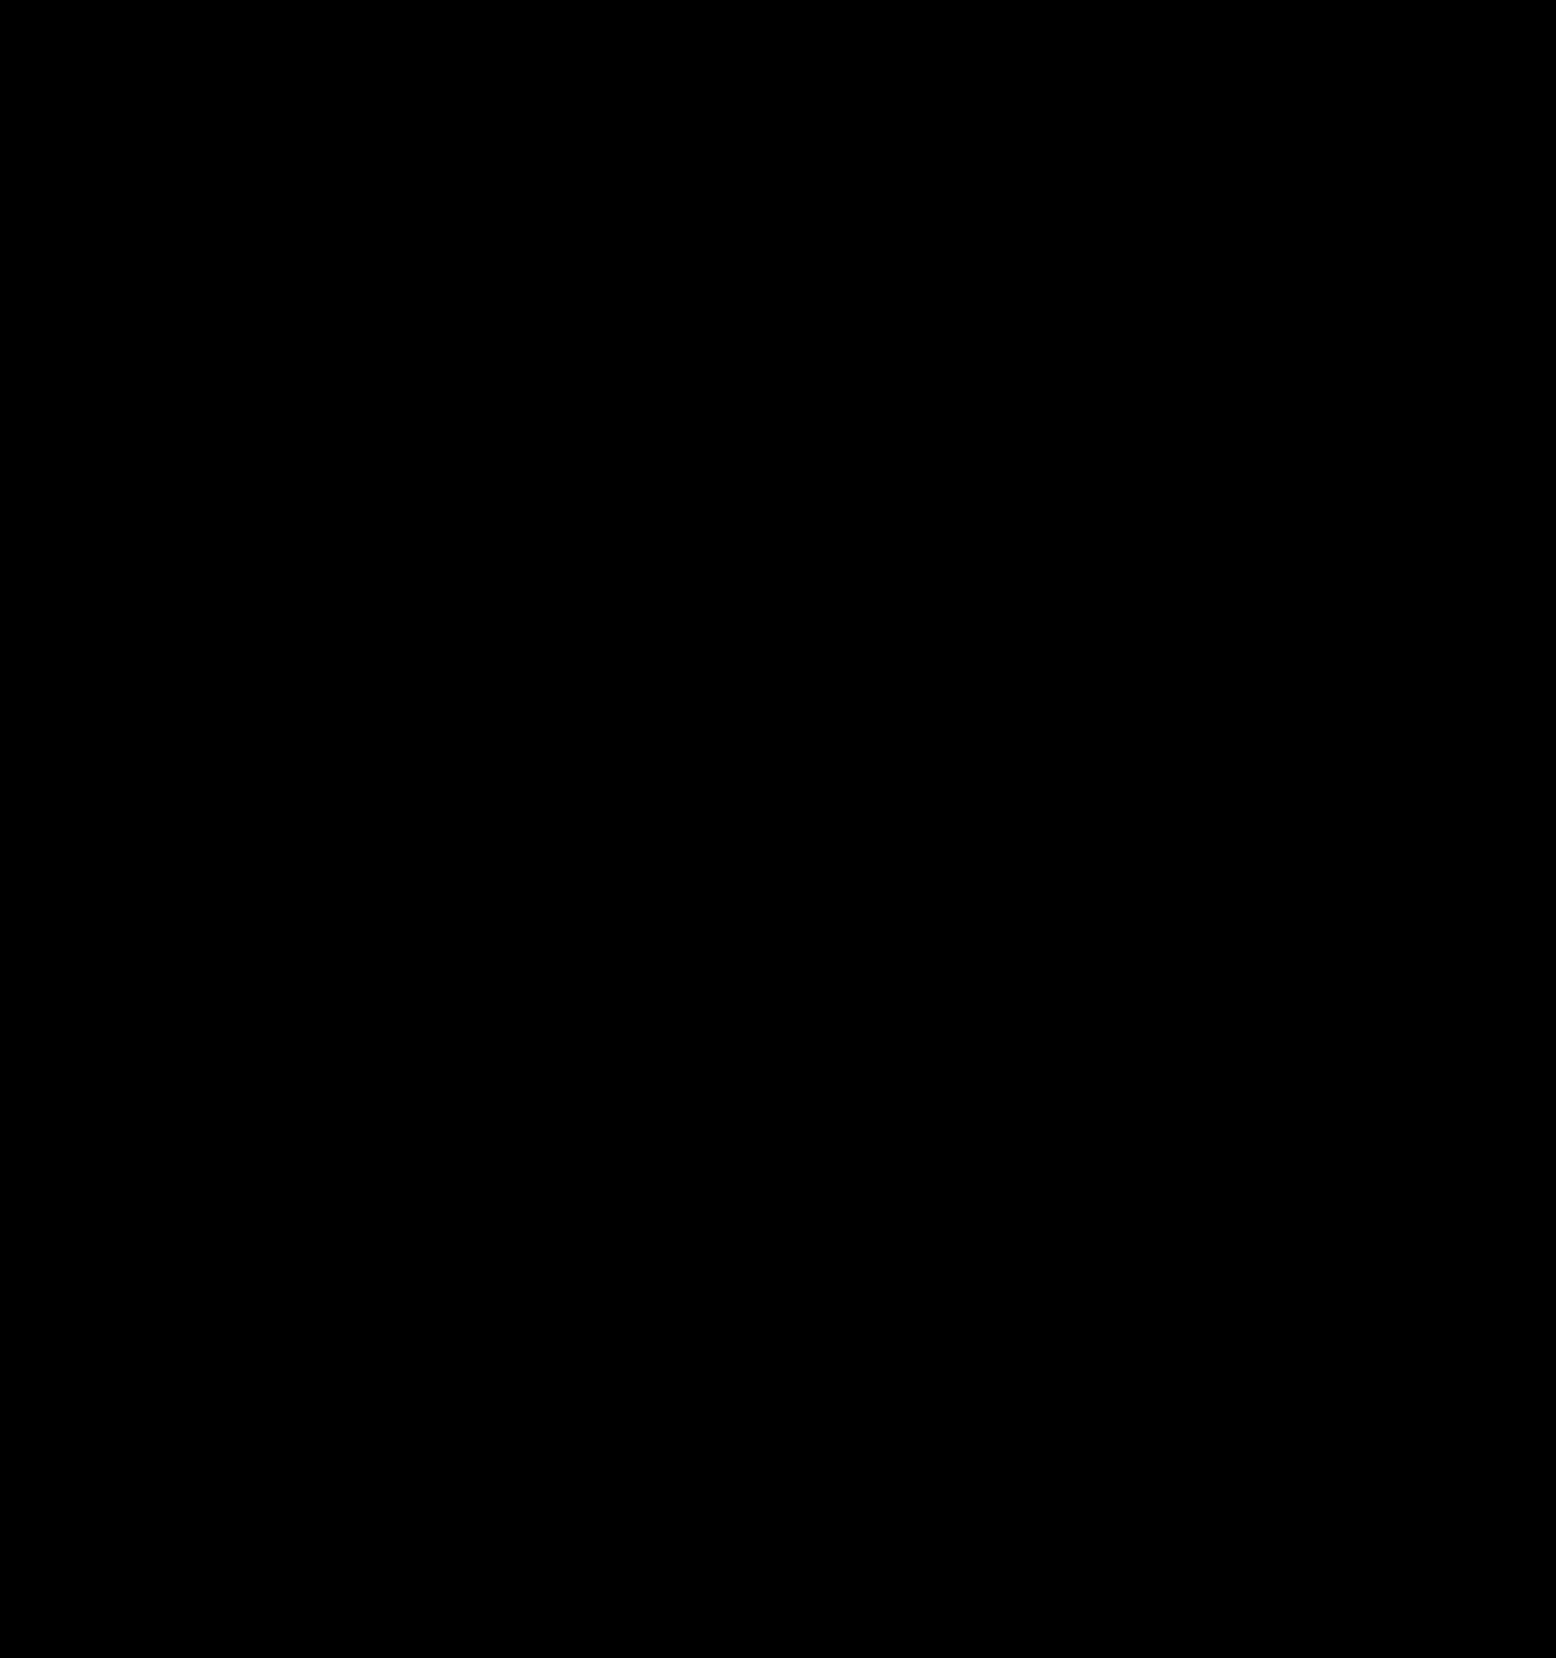 SGI-110